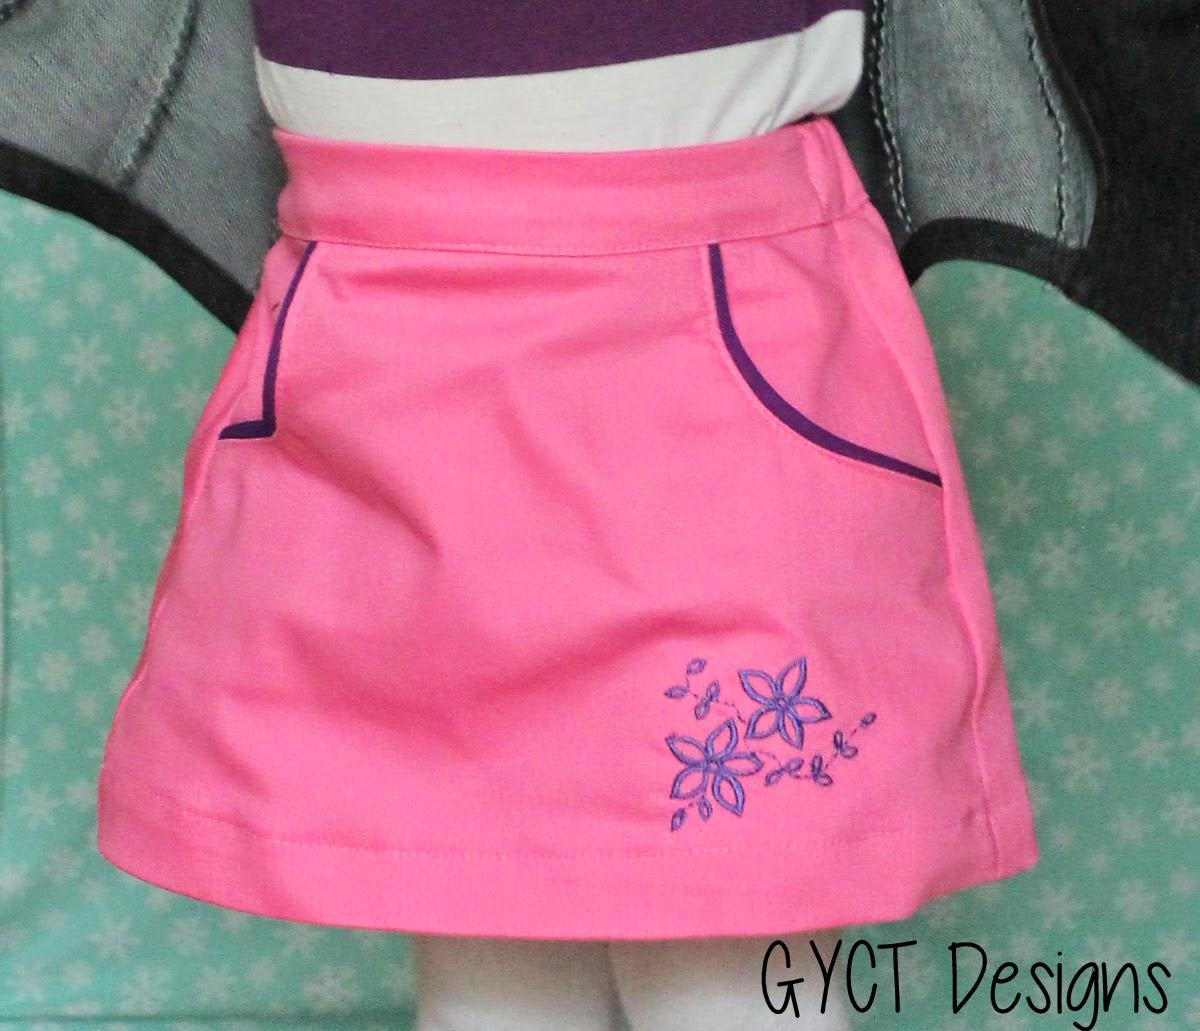 Potato Chip Skirt & Phresh Blazer for Girls Bundle Tour